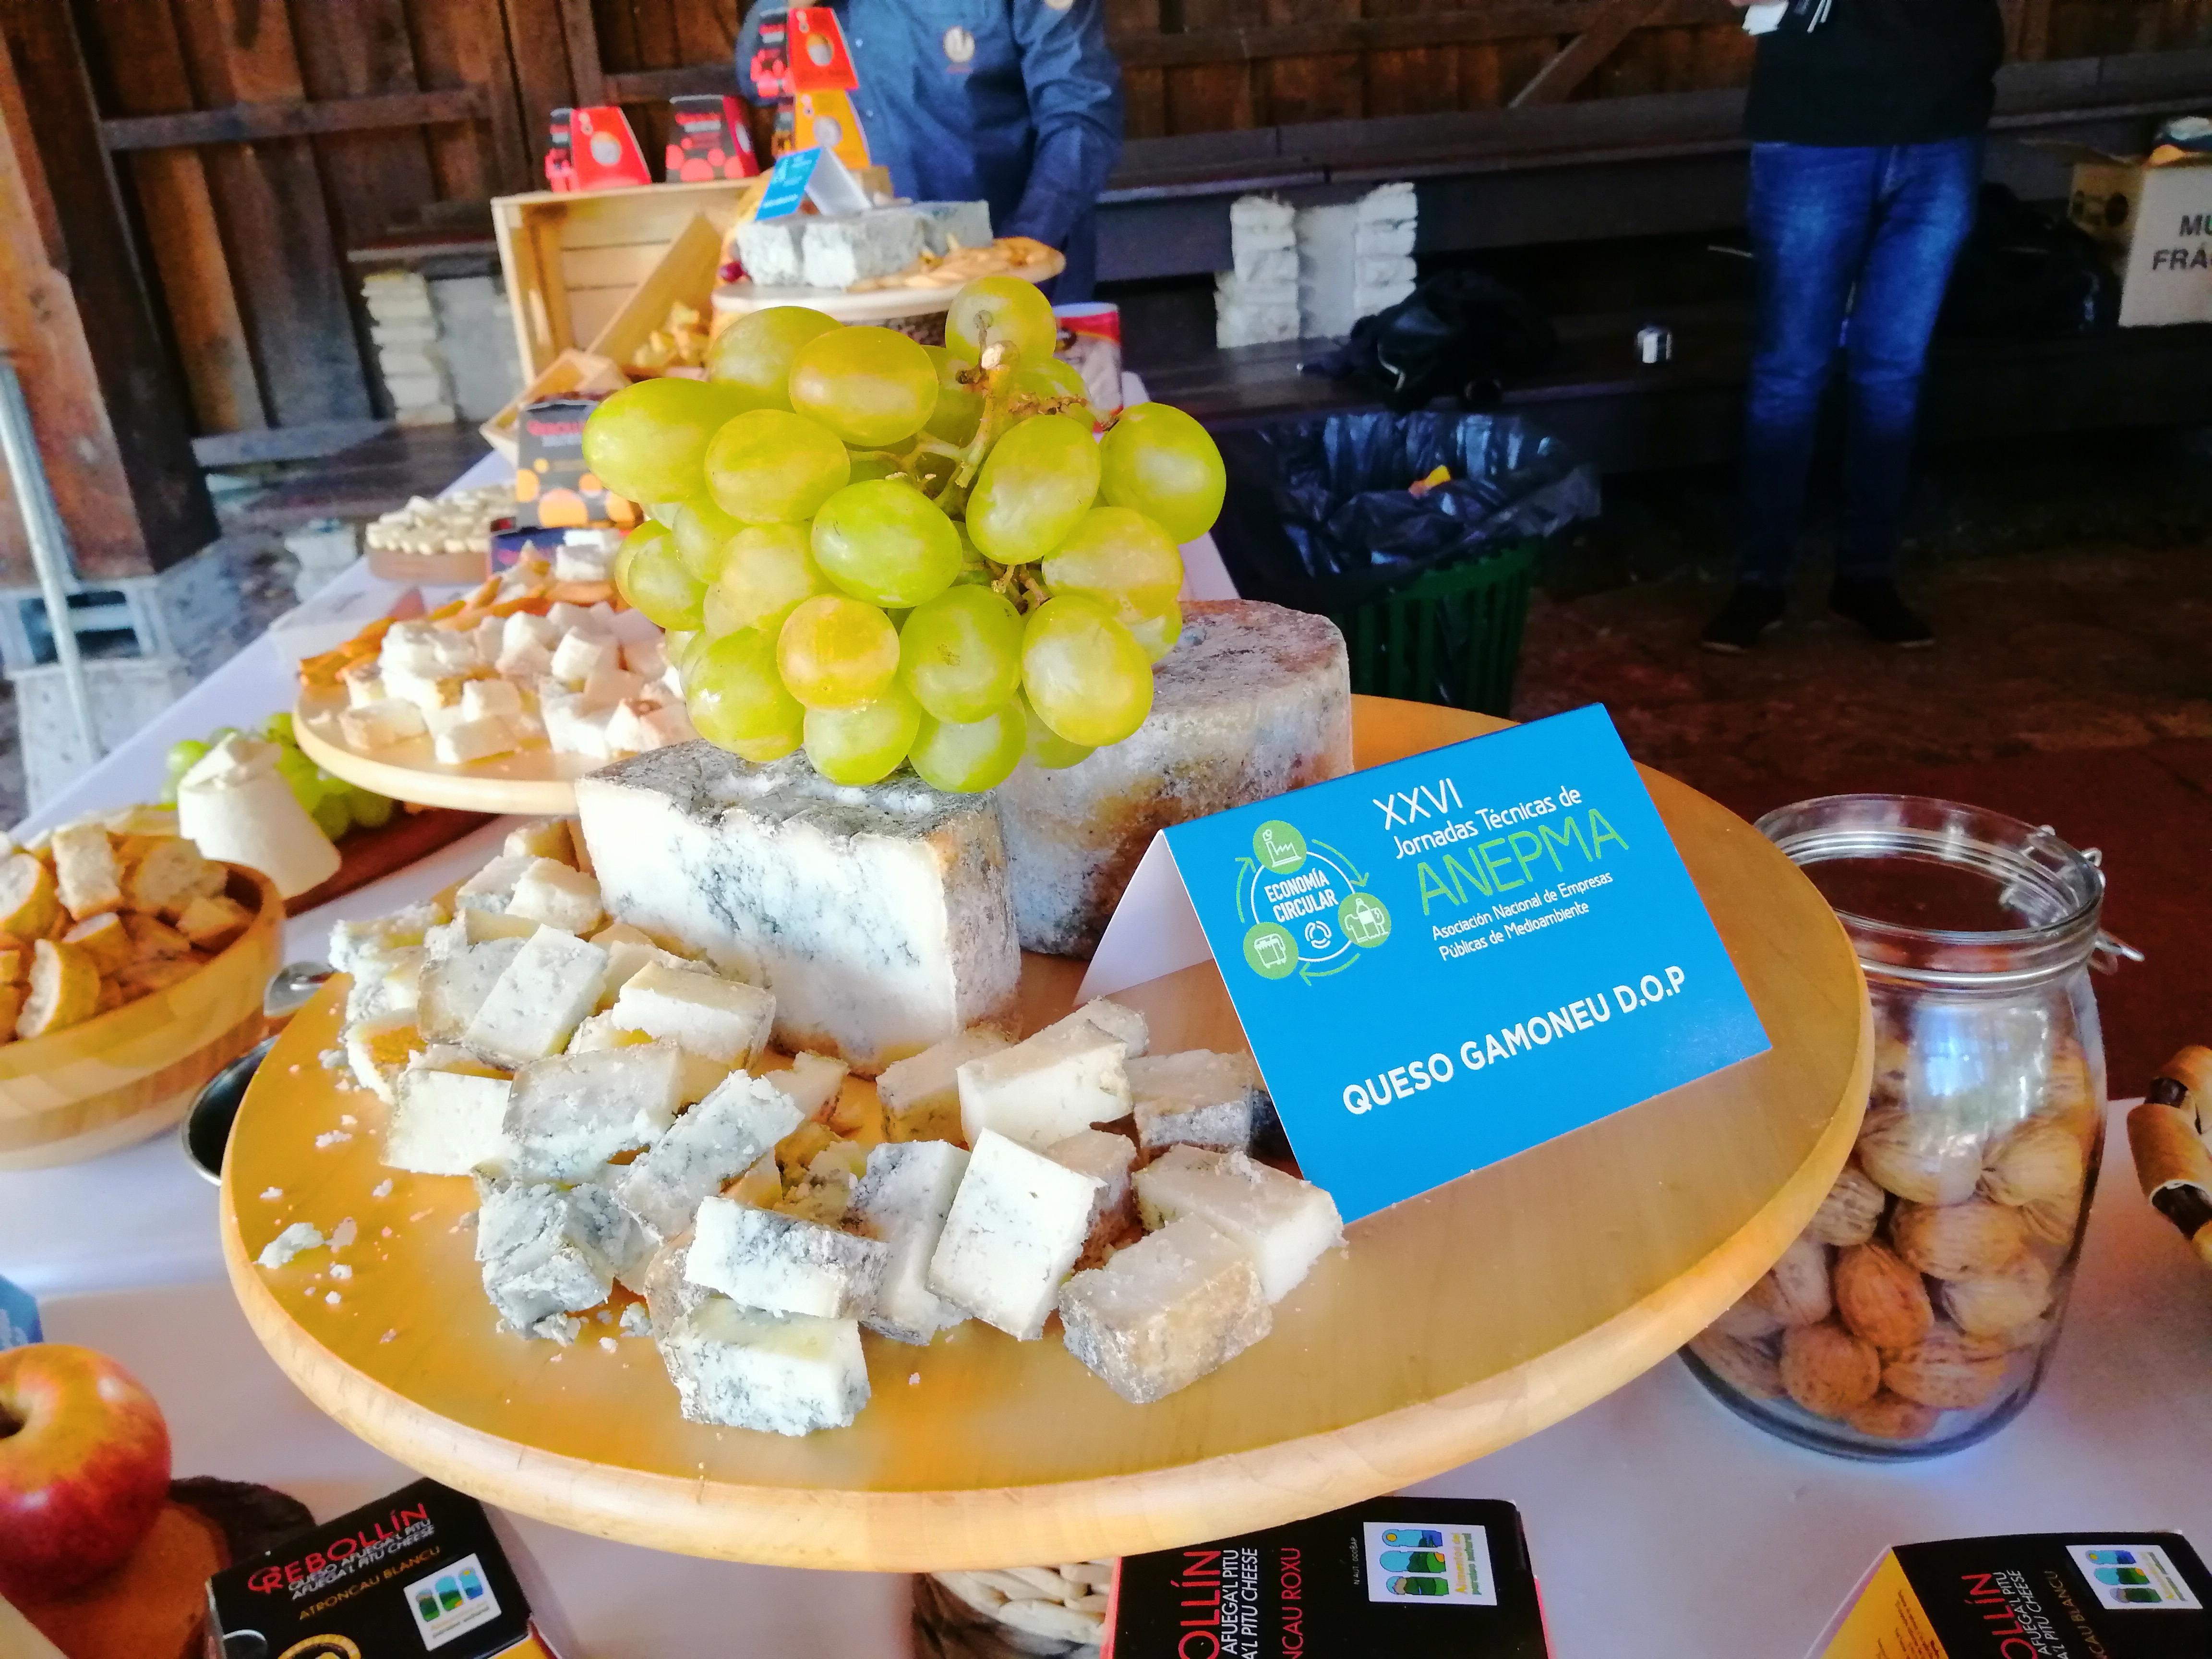 comidas de empresa madrid 2019